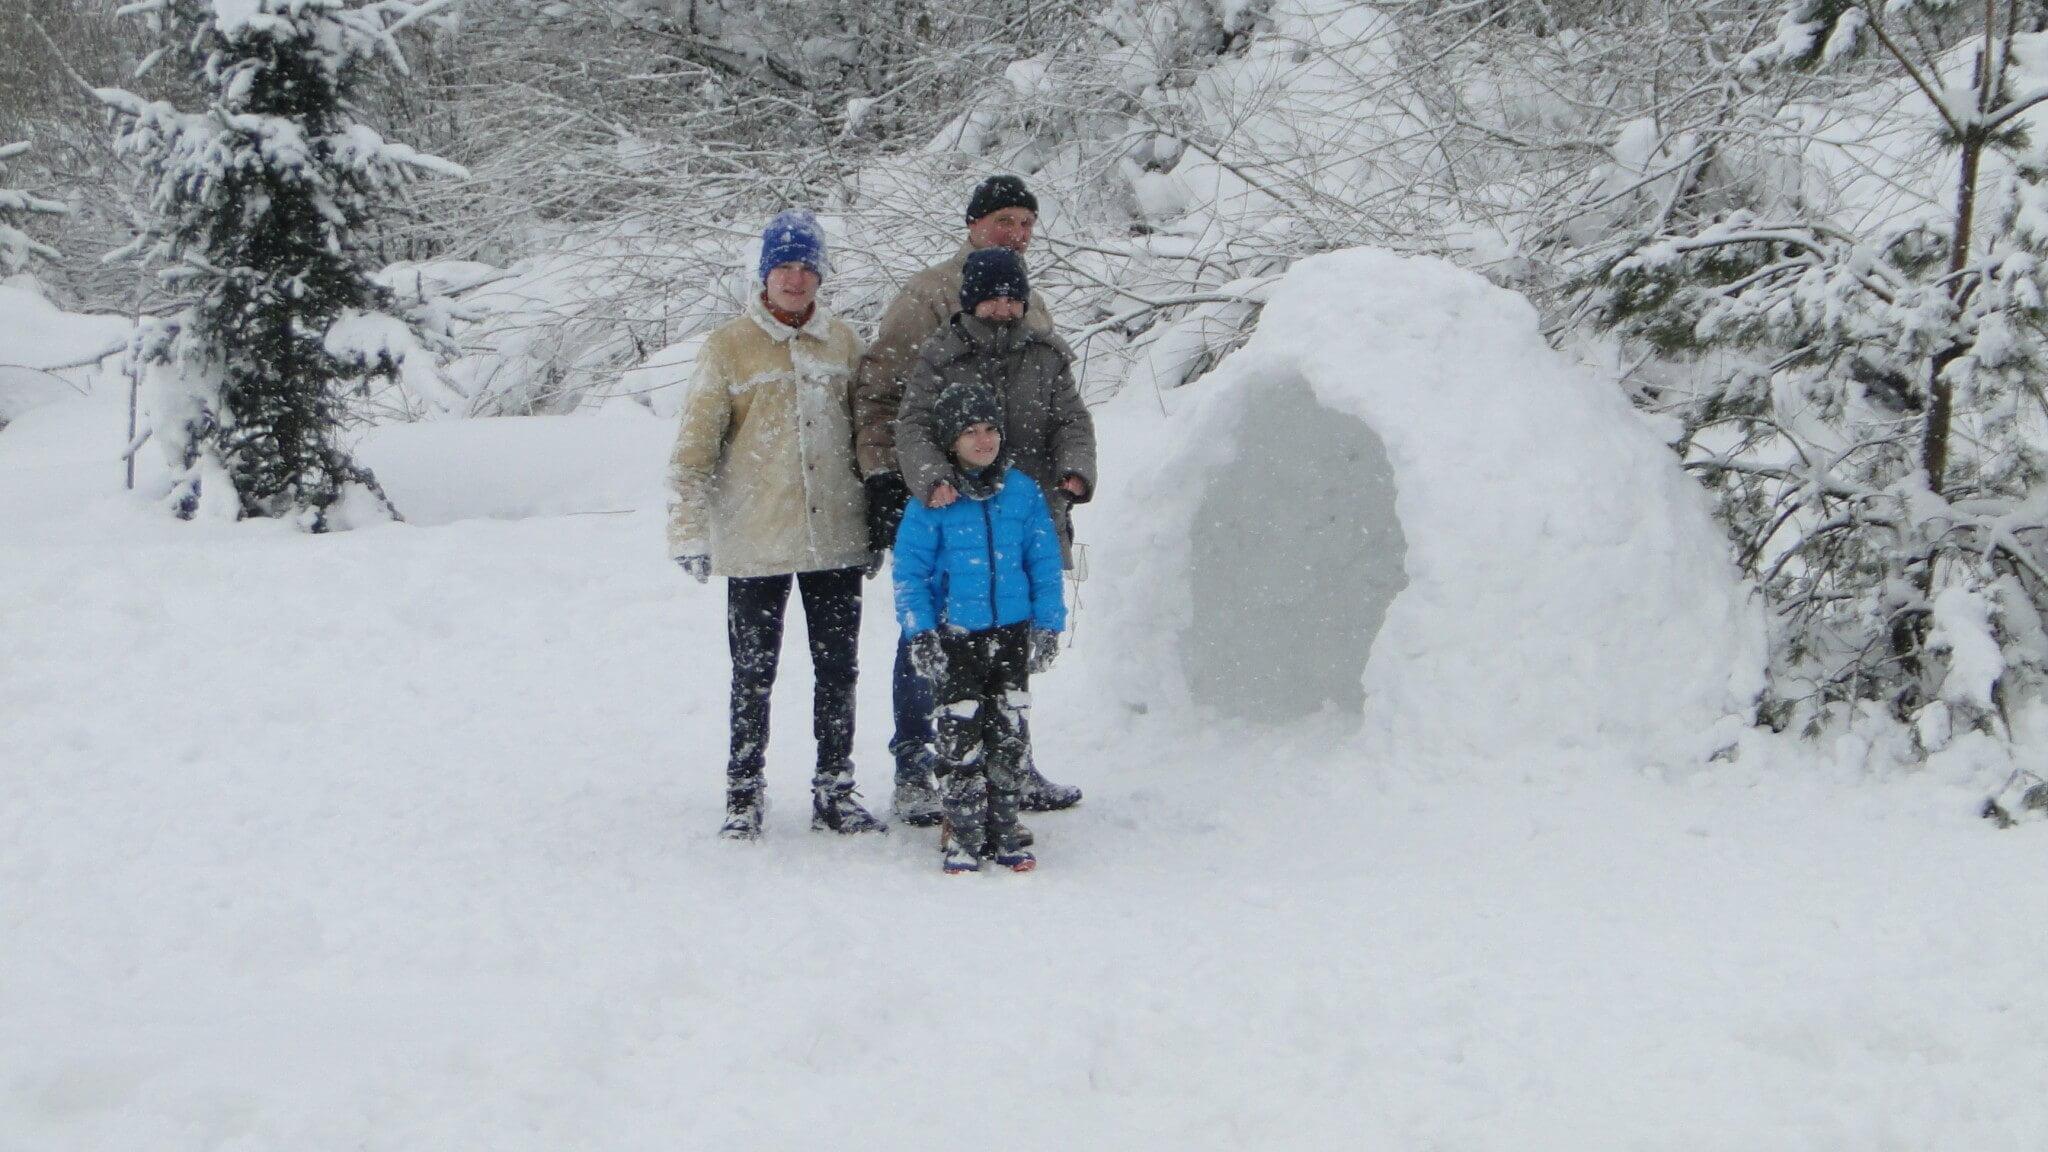 Lutowa zima - śnieżna i mroźna 16